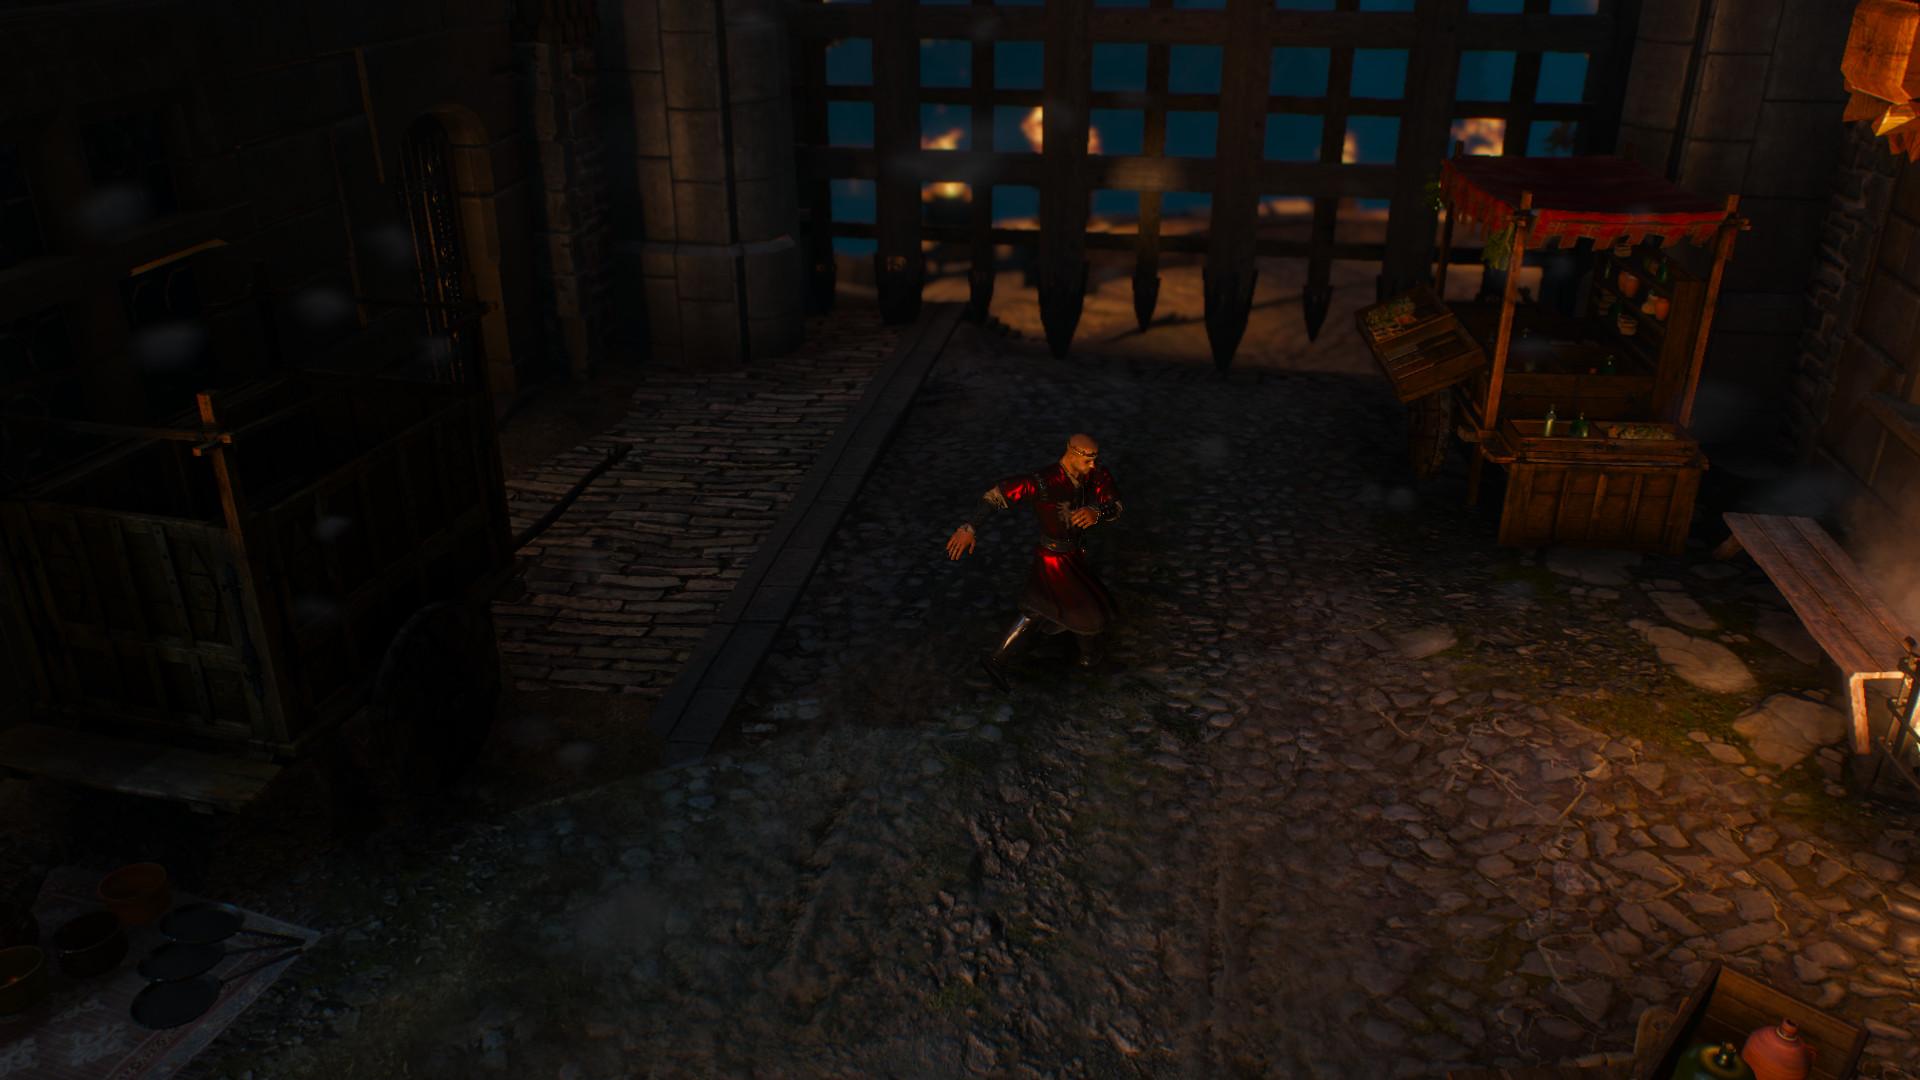 ТАНЦУЮТ ВСЕ.jpg - Witcher 3: Wild Hunt, the